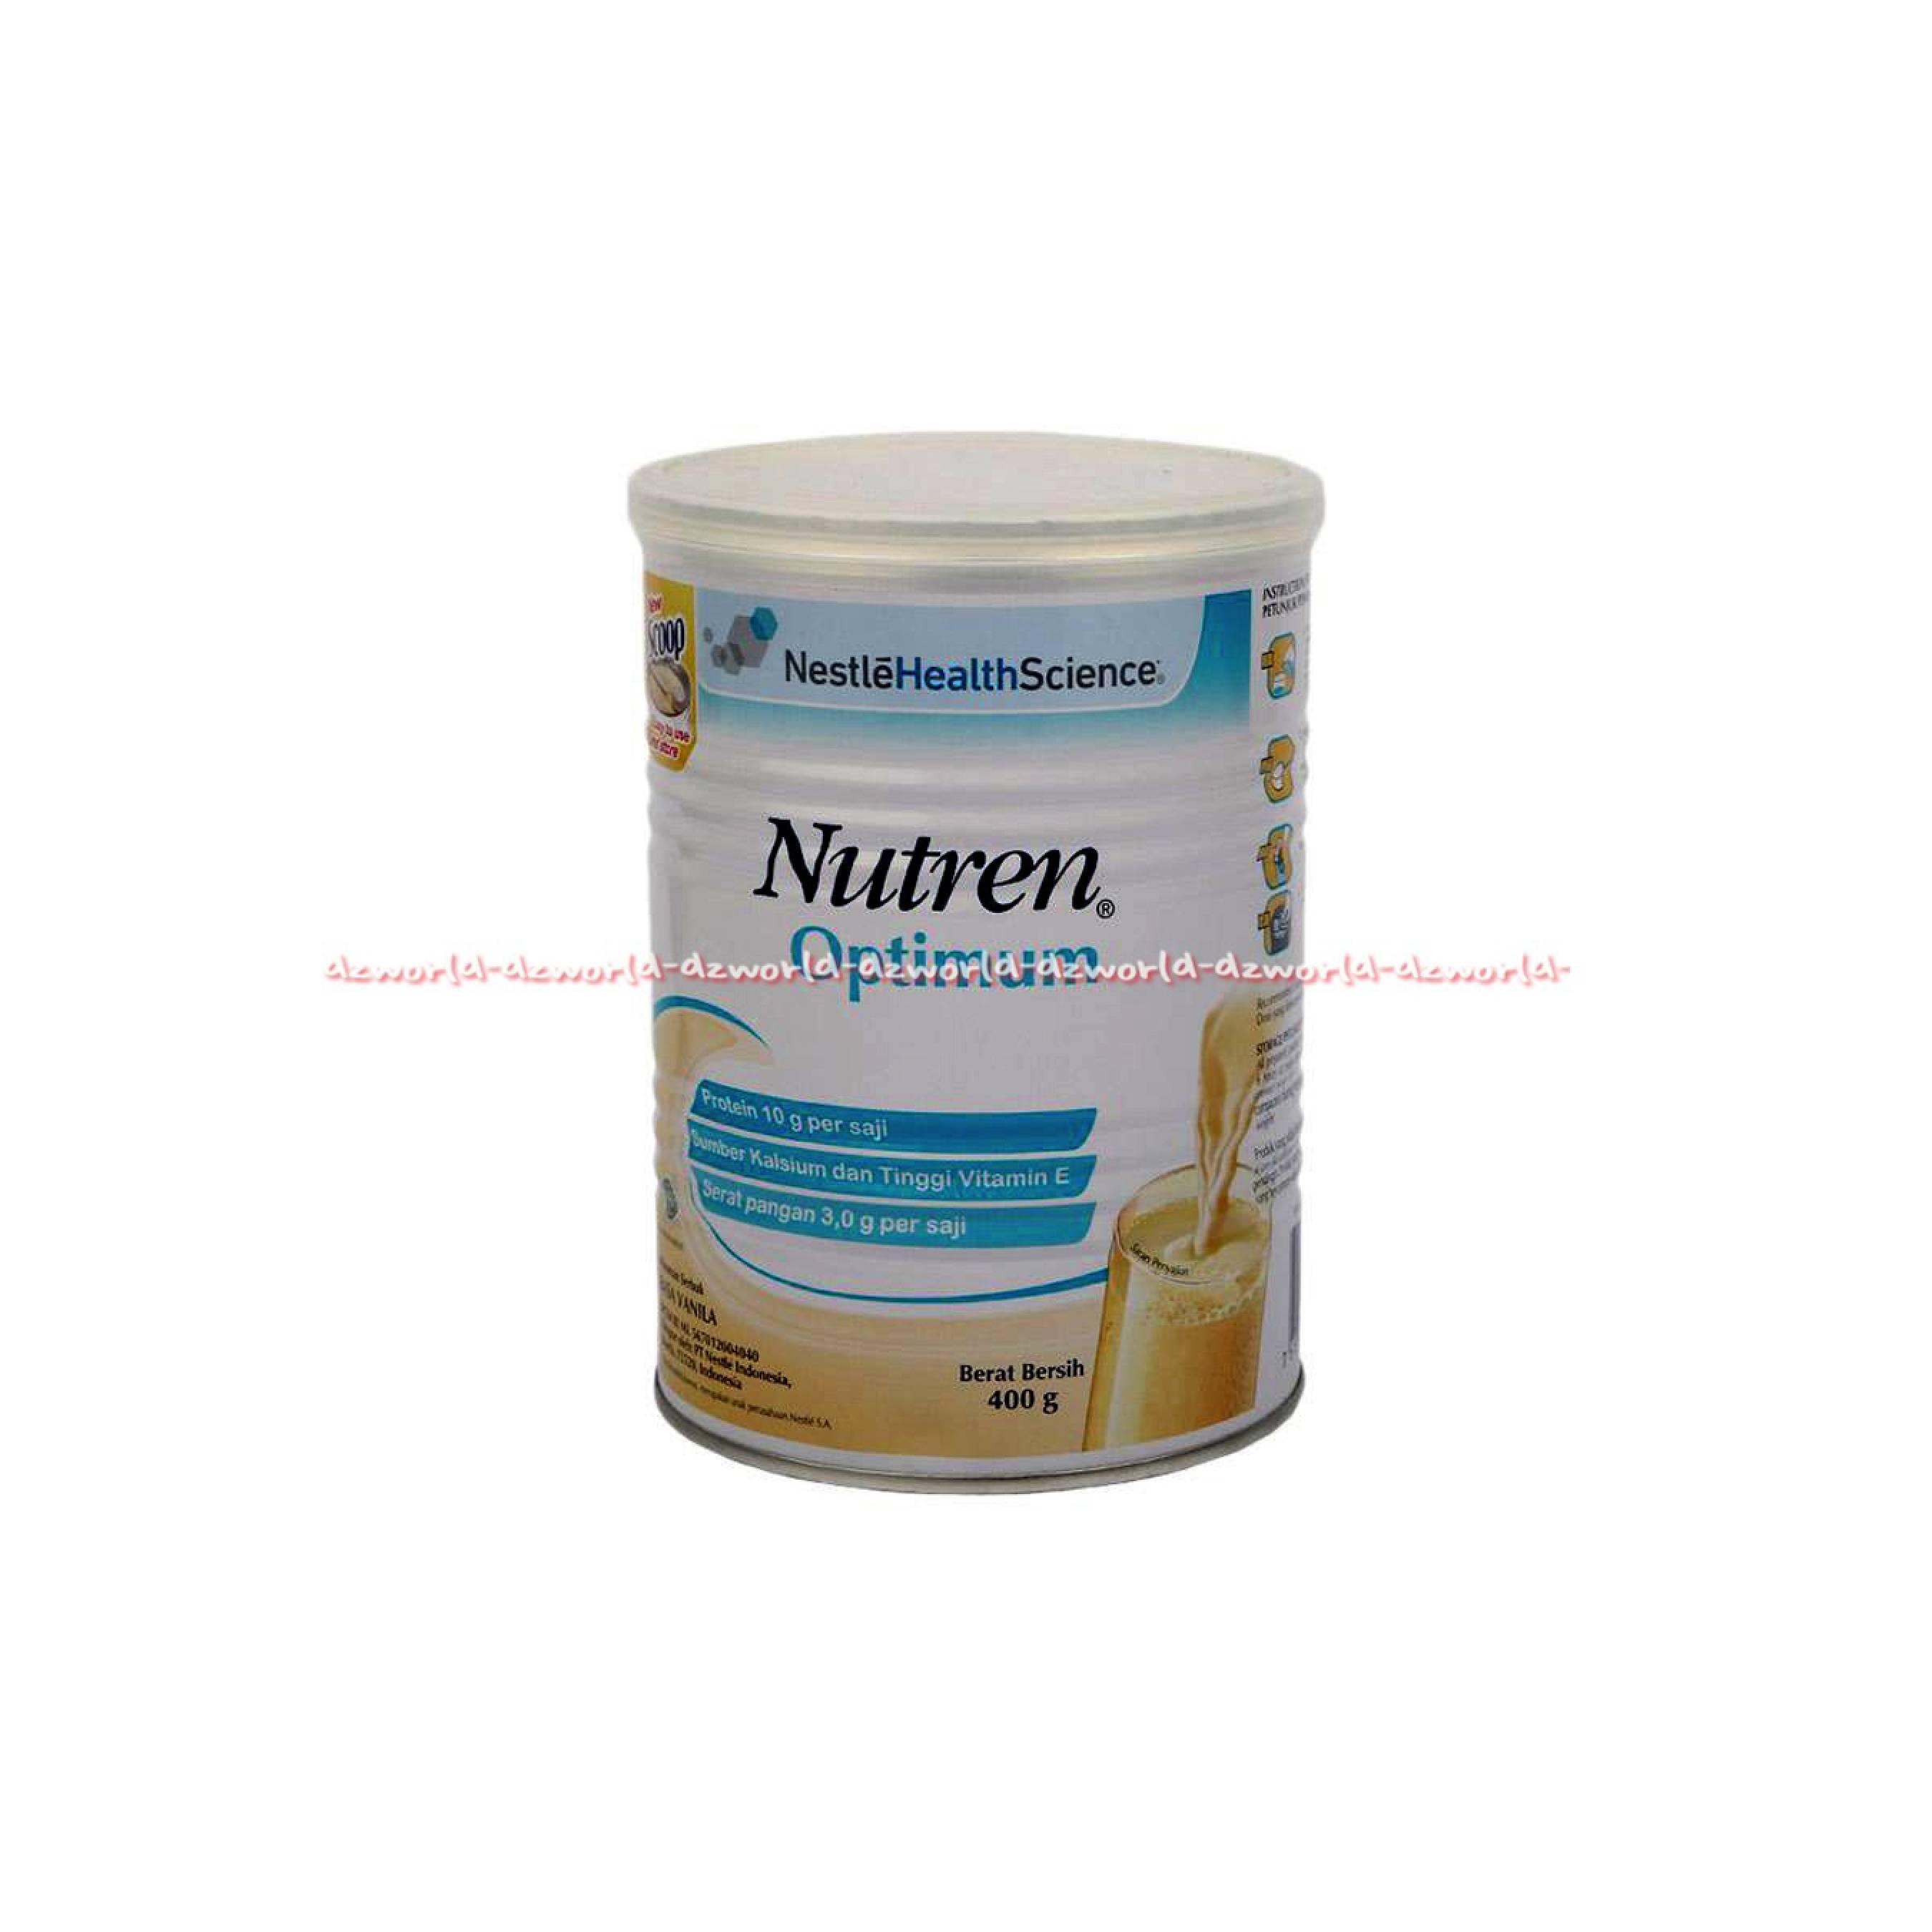 Jual Nutren Optimum Prebio 800gr Bundle 2 Kaleng Free Tas Motif Source · Nutren Optimum Susu